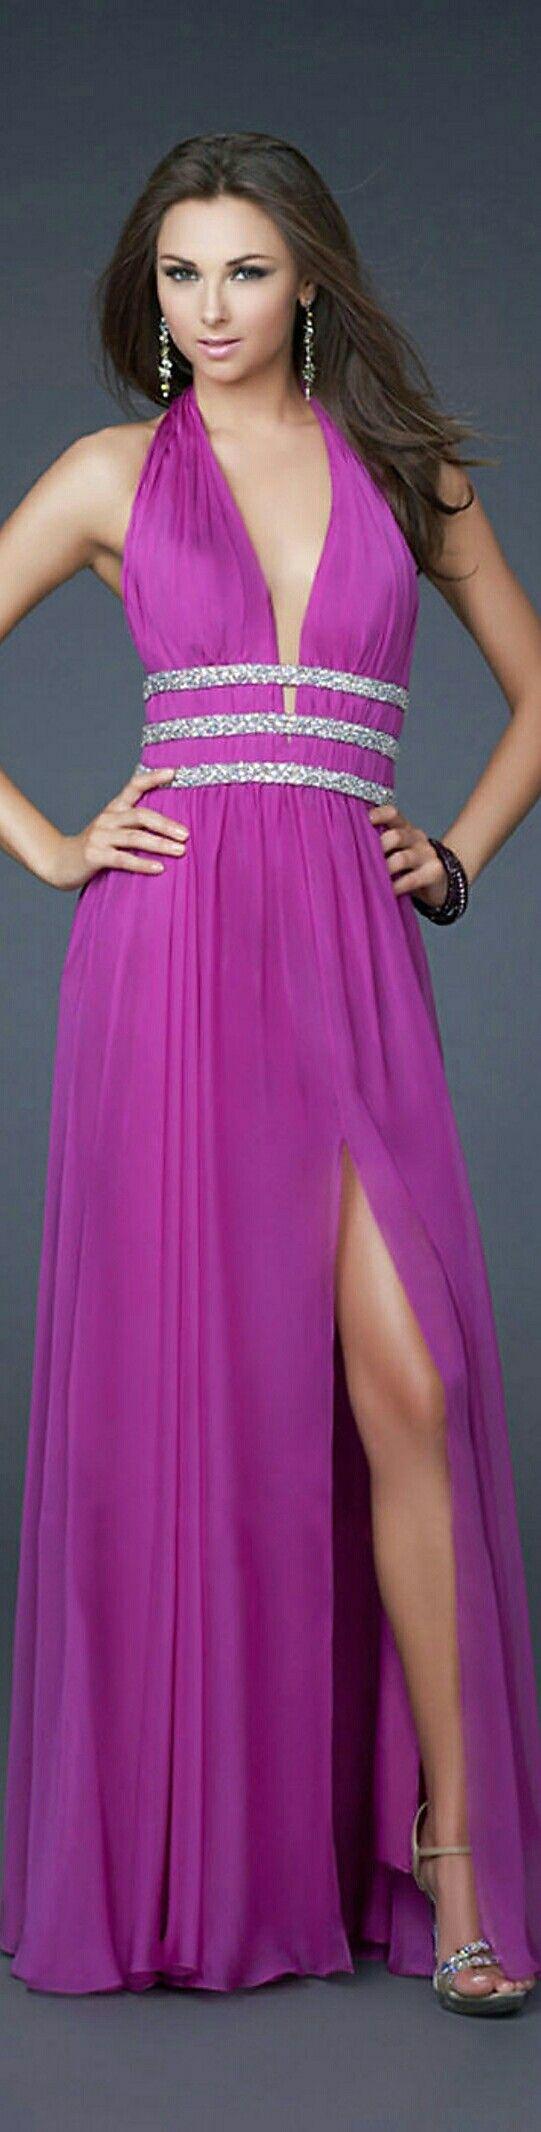 Magenta Prom/Bridesmaids w. Triplicate Beaded Waist Belts, Slit on L ...